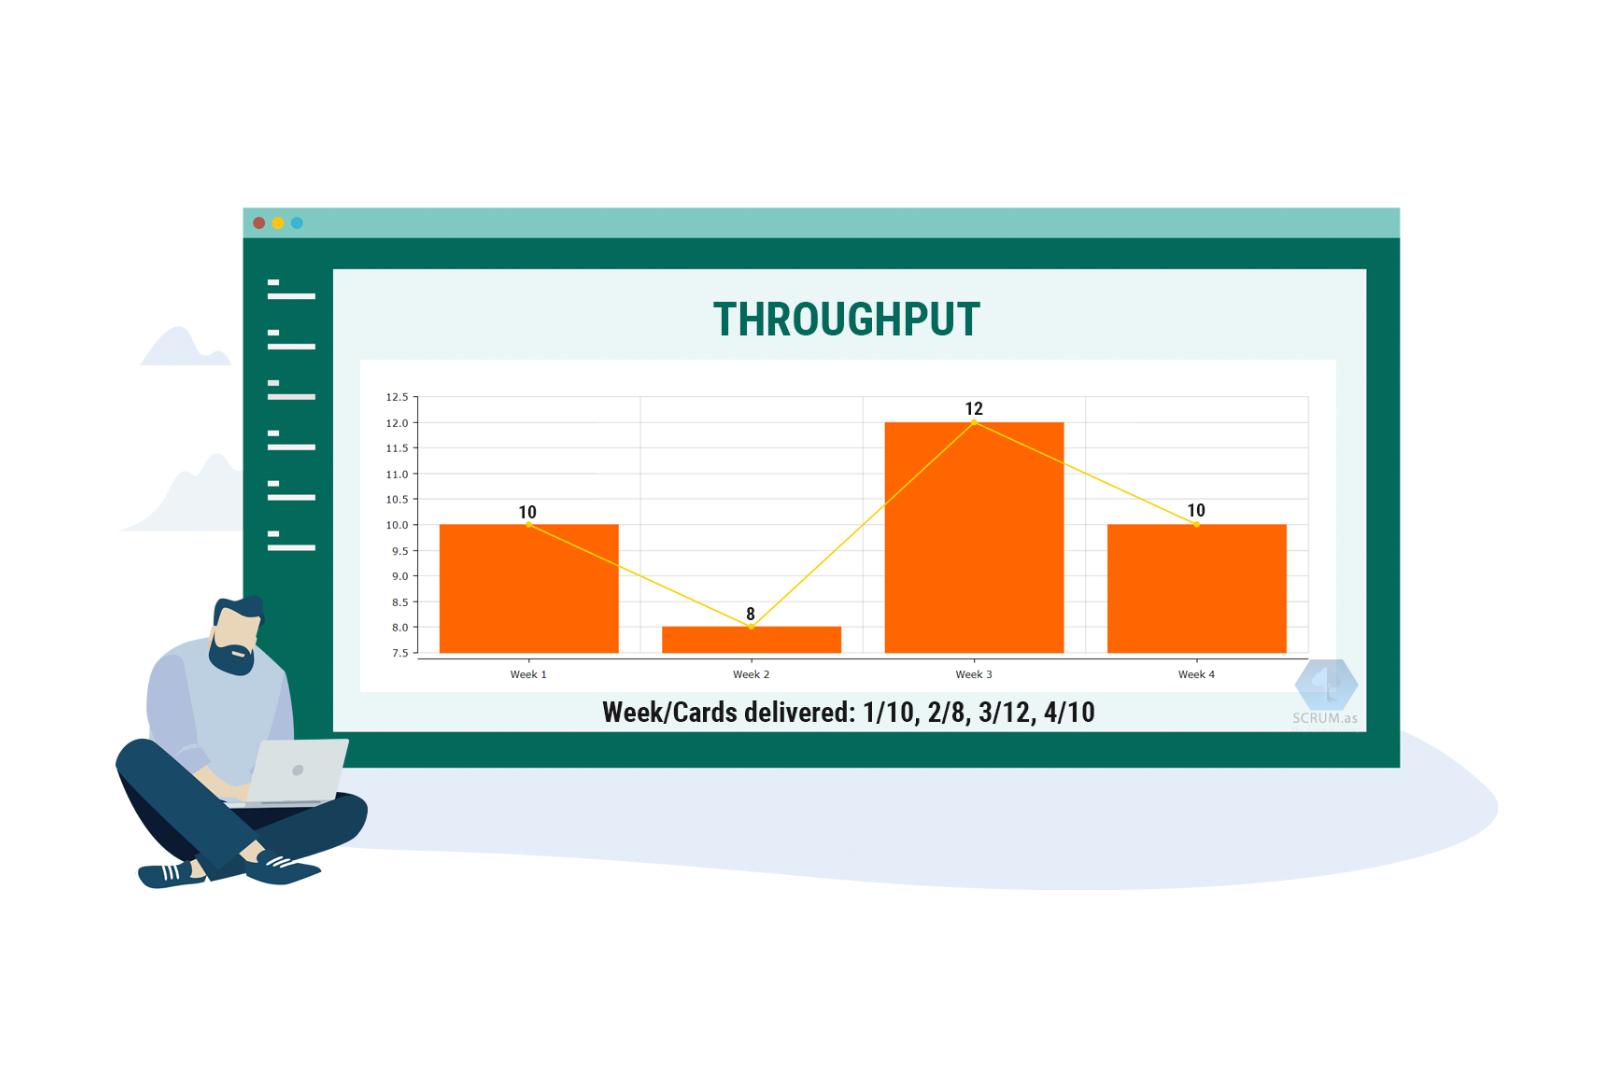 software development team Throughput